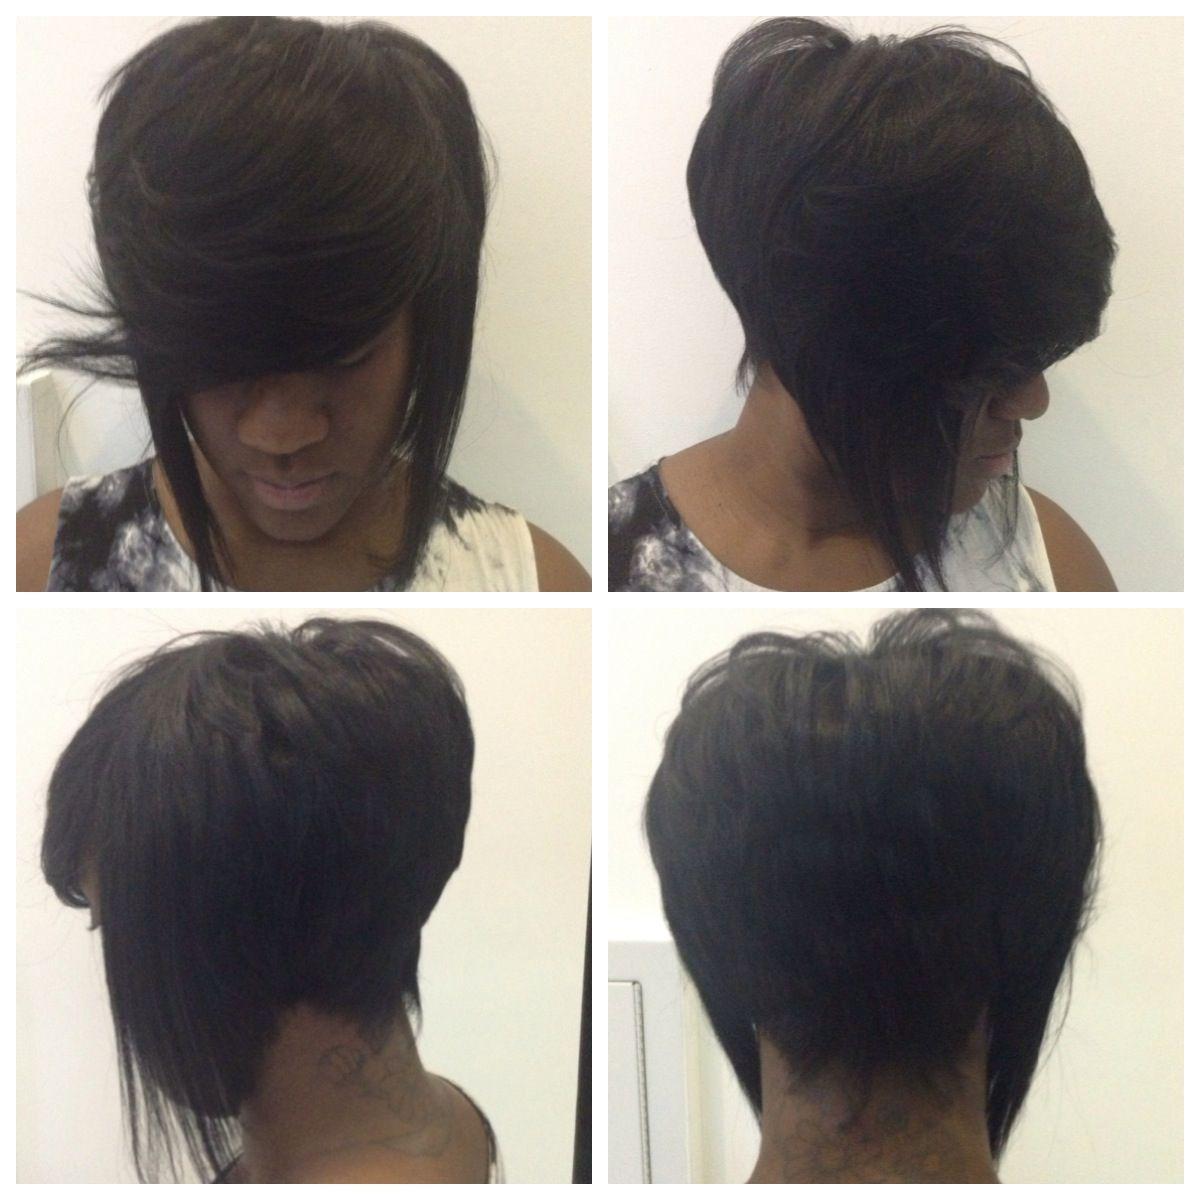 bonding bob in between the hair | bob | short hair styles